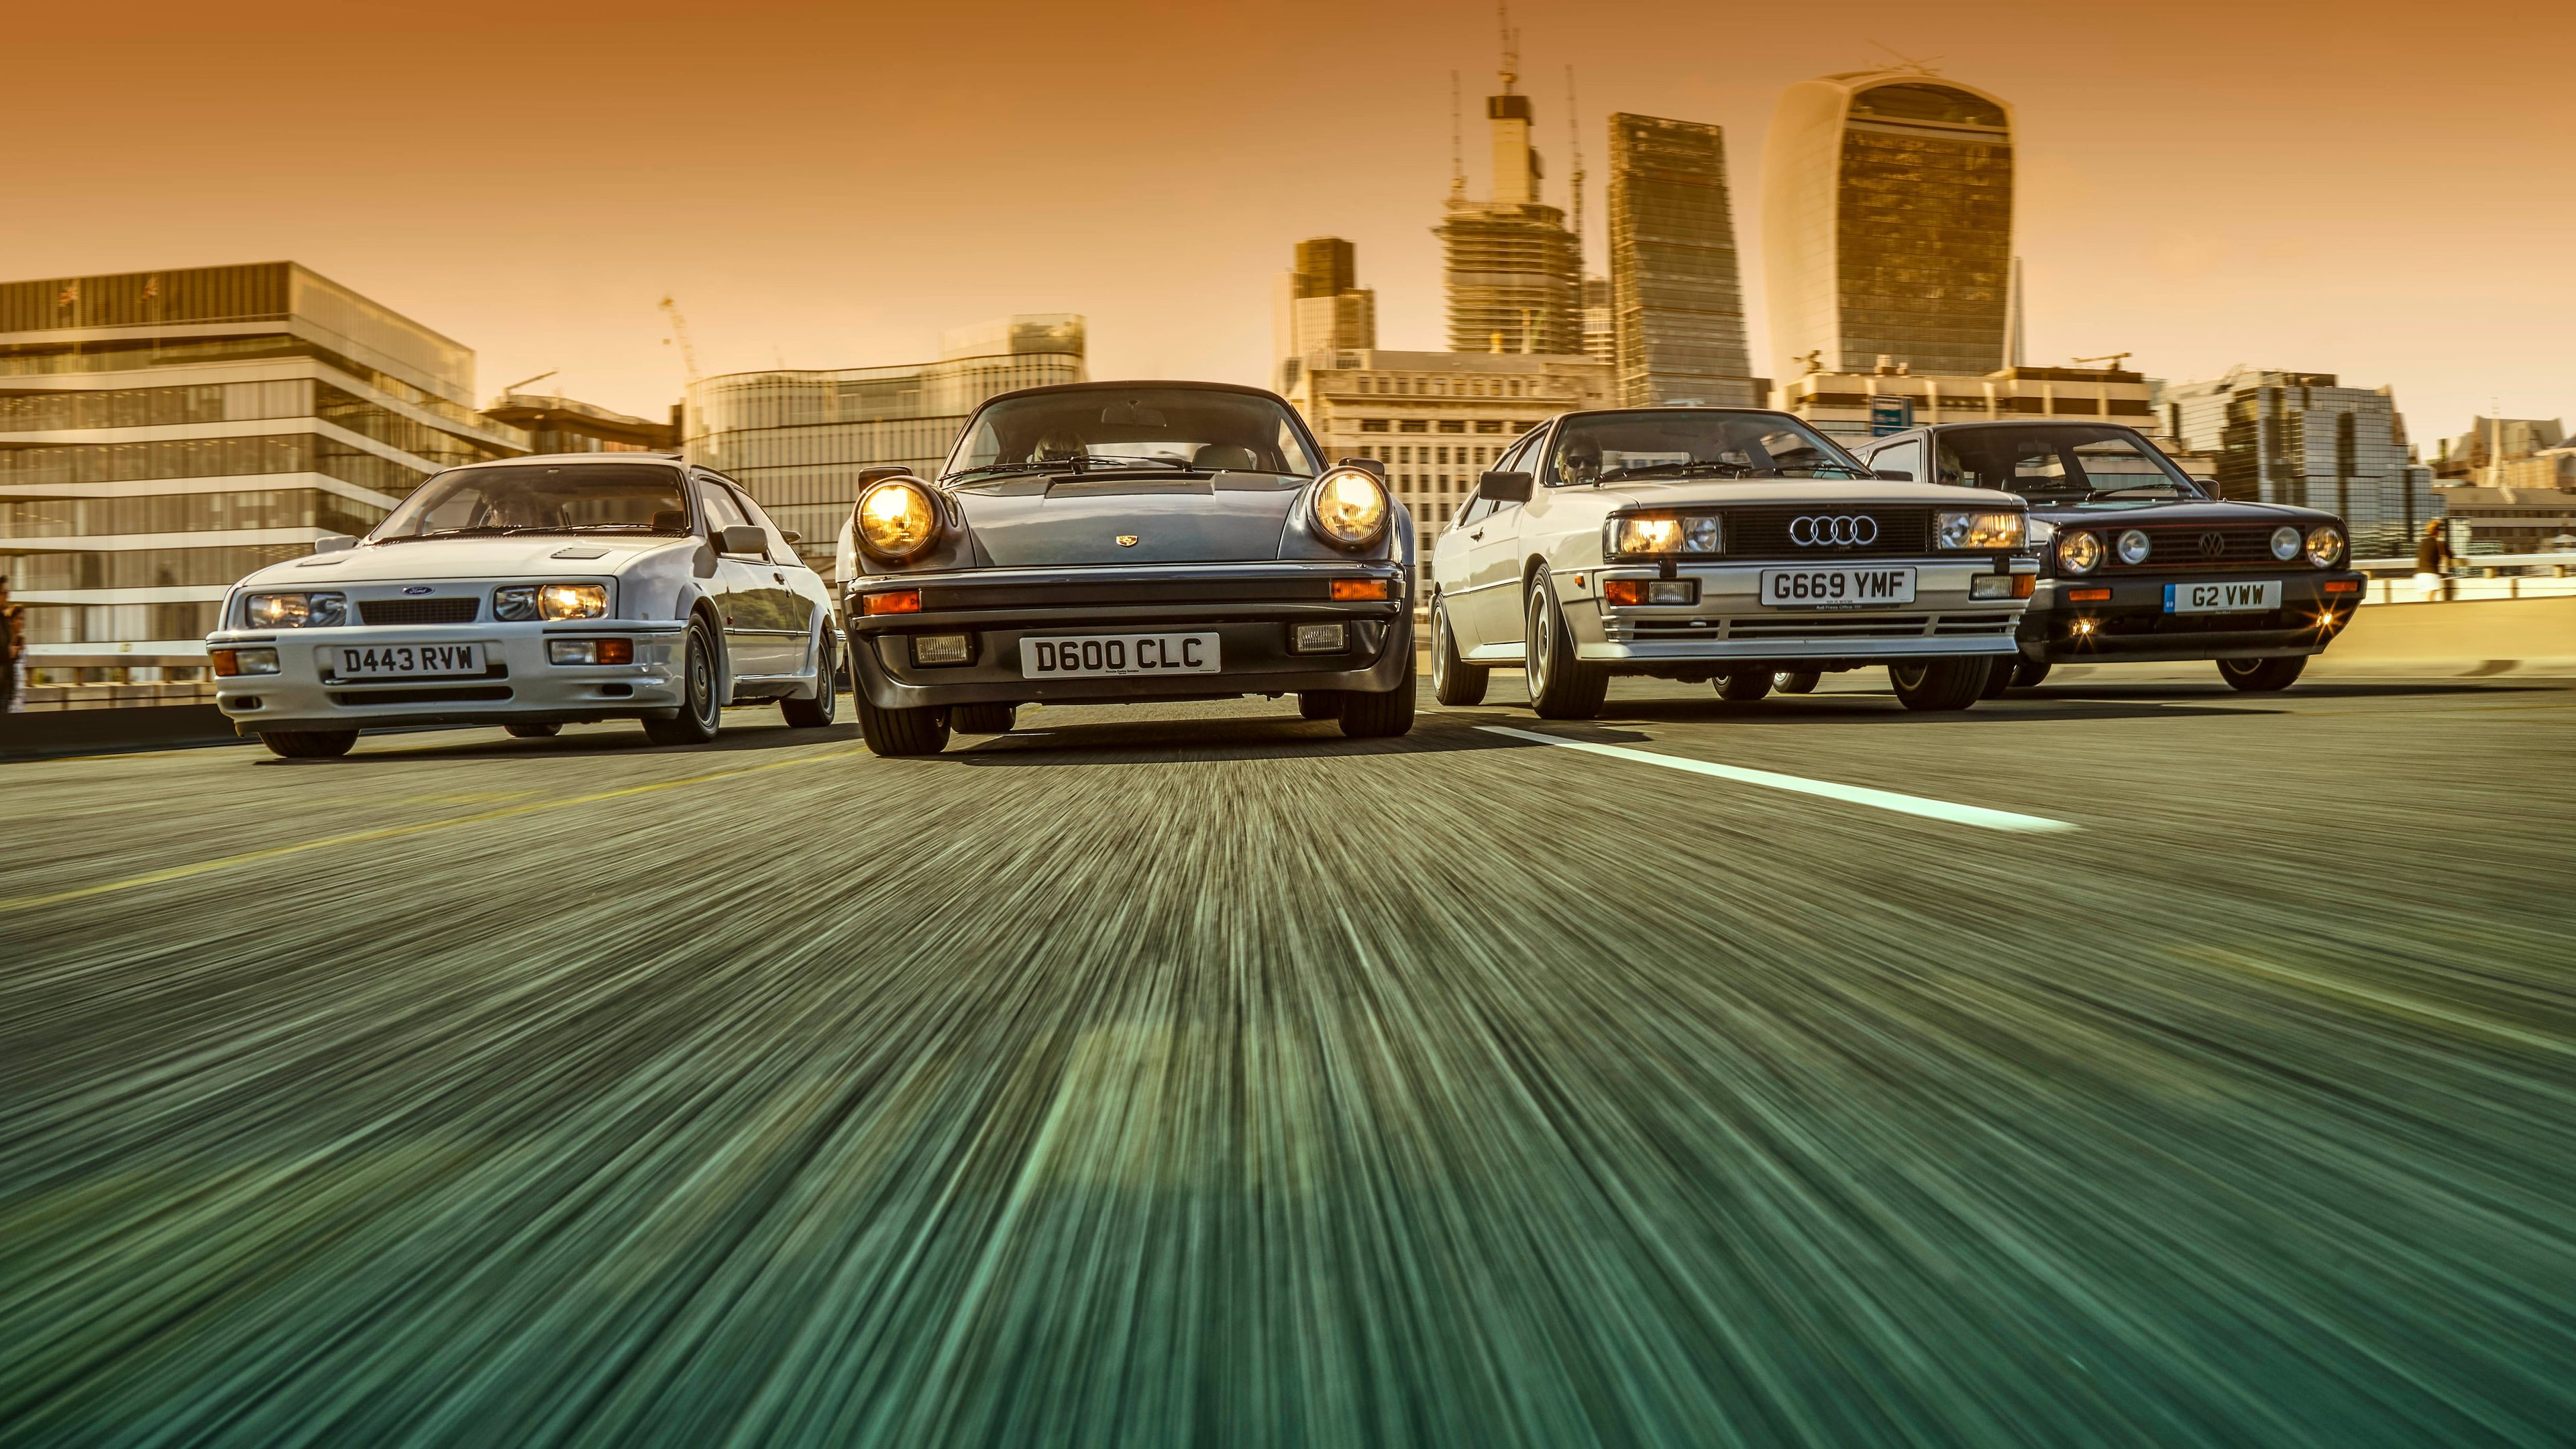 top gear cars 4k 1539112557 - Top Gear Cars 4k - top gear wallpapers, hd-wallpapers, cars wallpapers, 4k-wallpapers